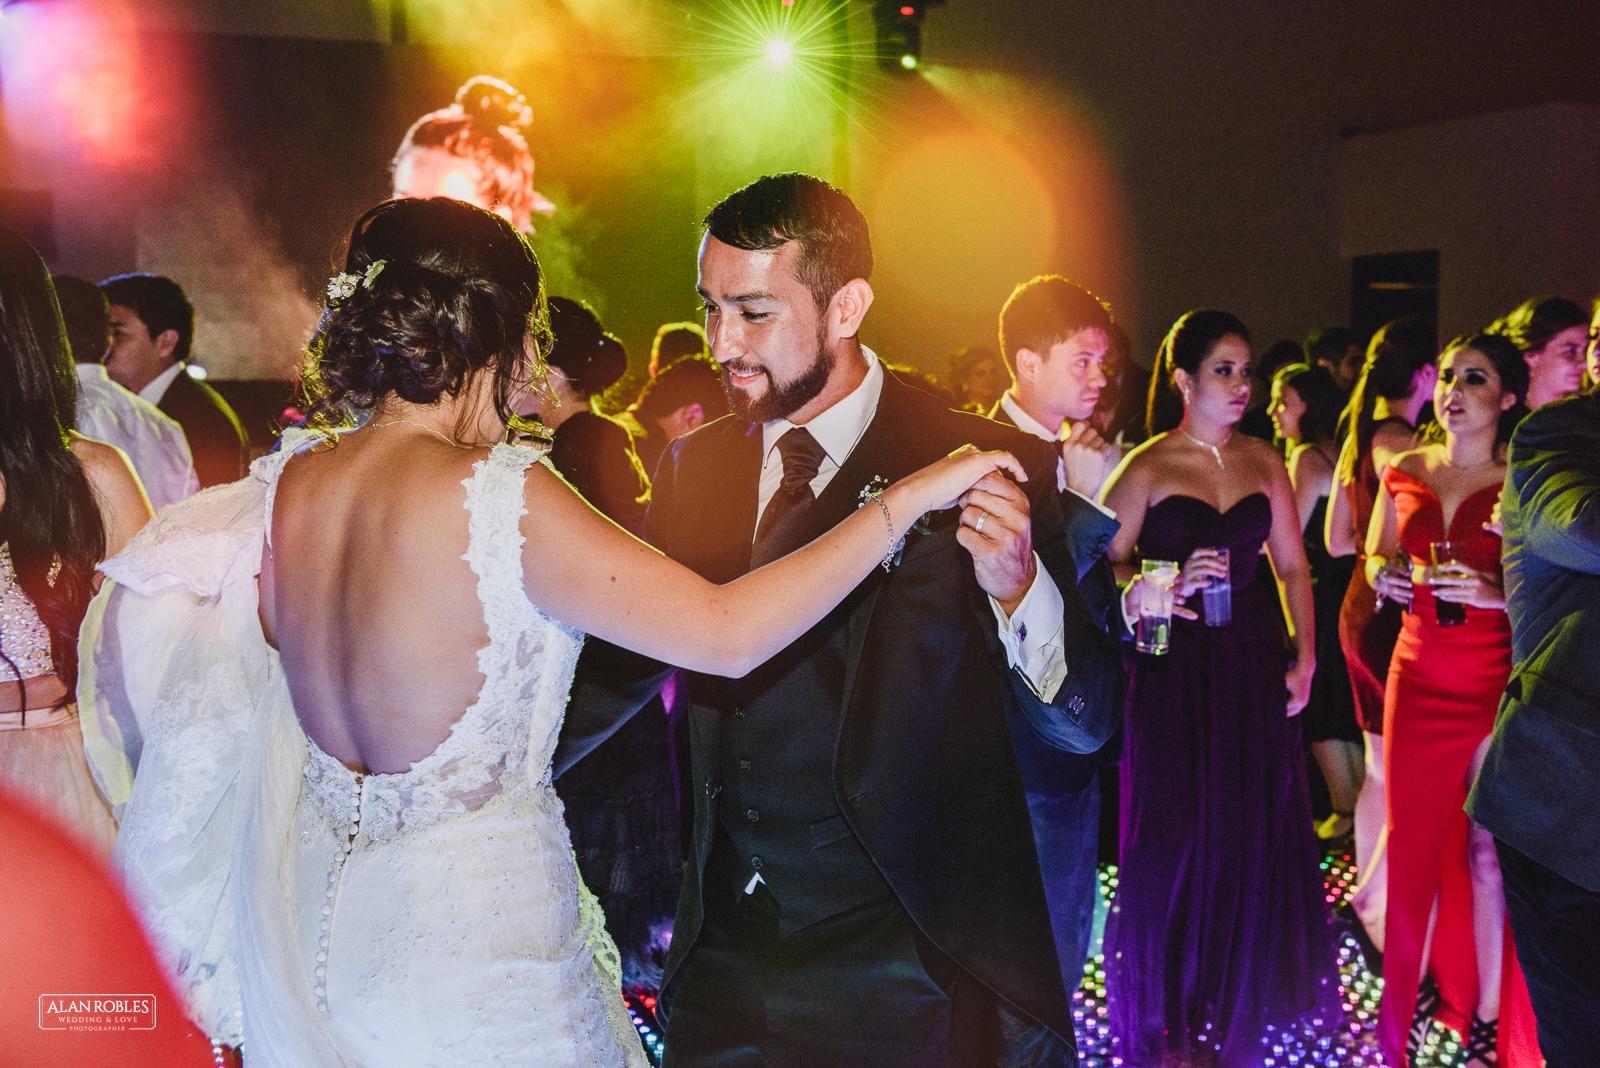 Fotografo de bodas Alan Robles-Boda en Guadalajara Real San Javier-68